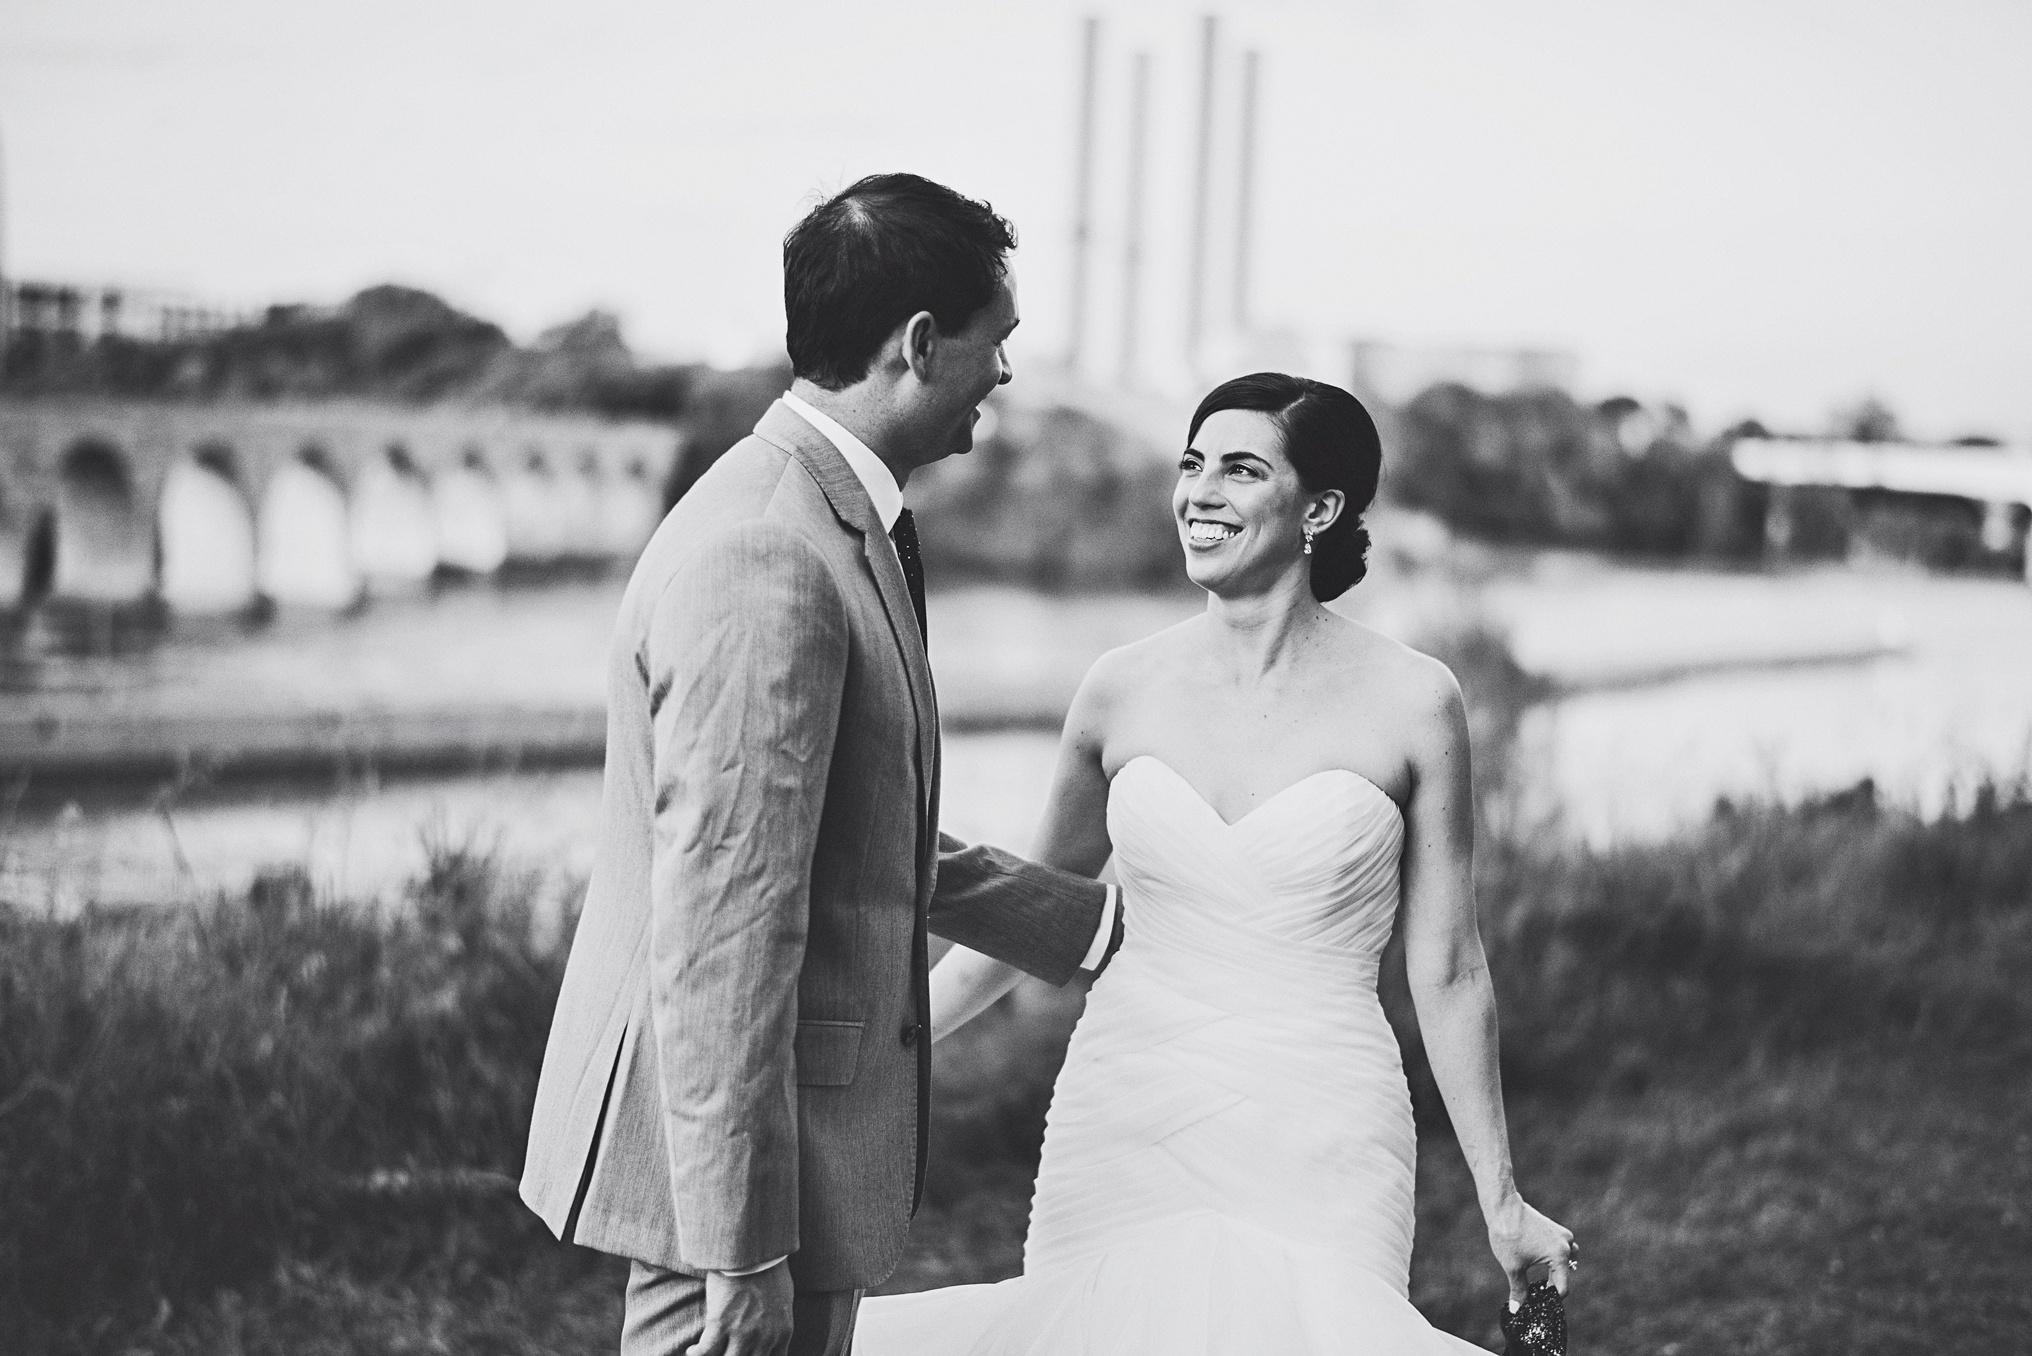 best_wedding_photography_2017_by_lucas_botz_photography_122.jpg